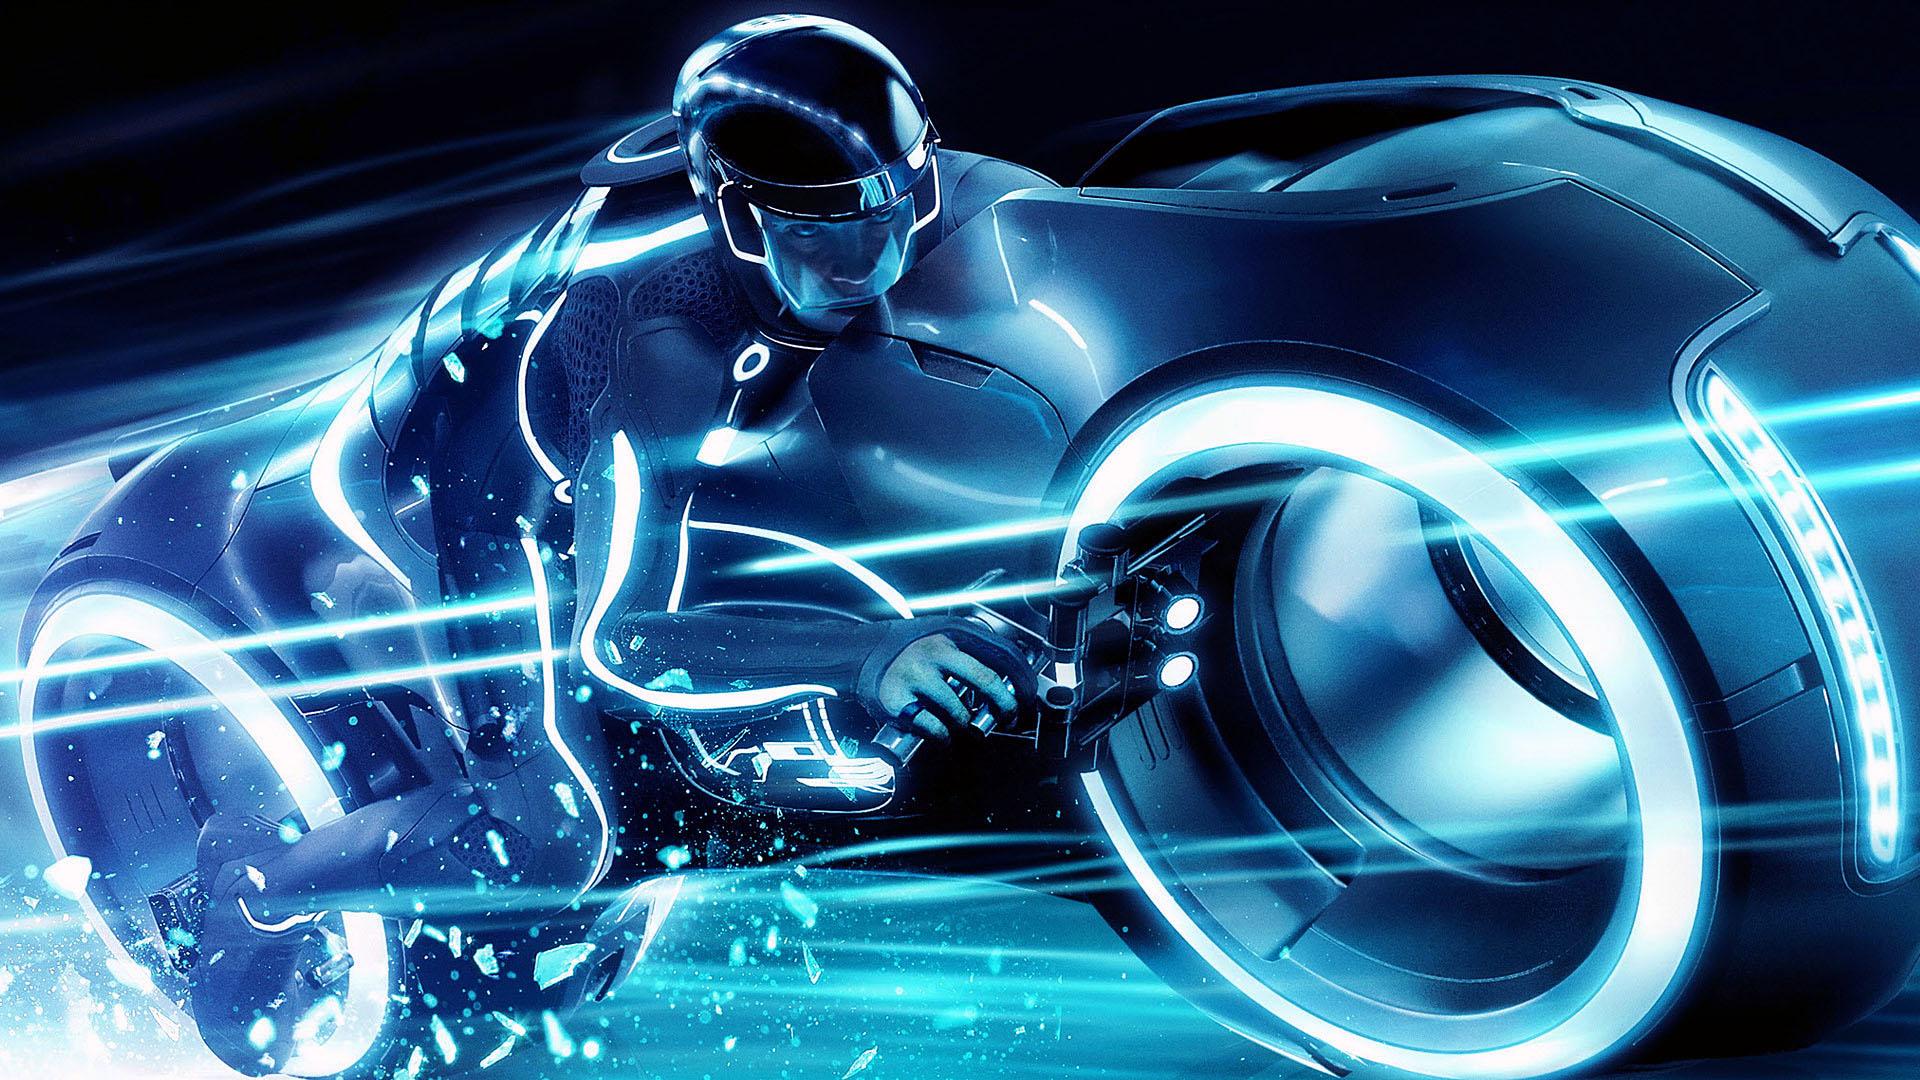 Bike Race Wallpapers Tron Bike Race Myspace Backgrounds Tron Bike 1920x1080